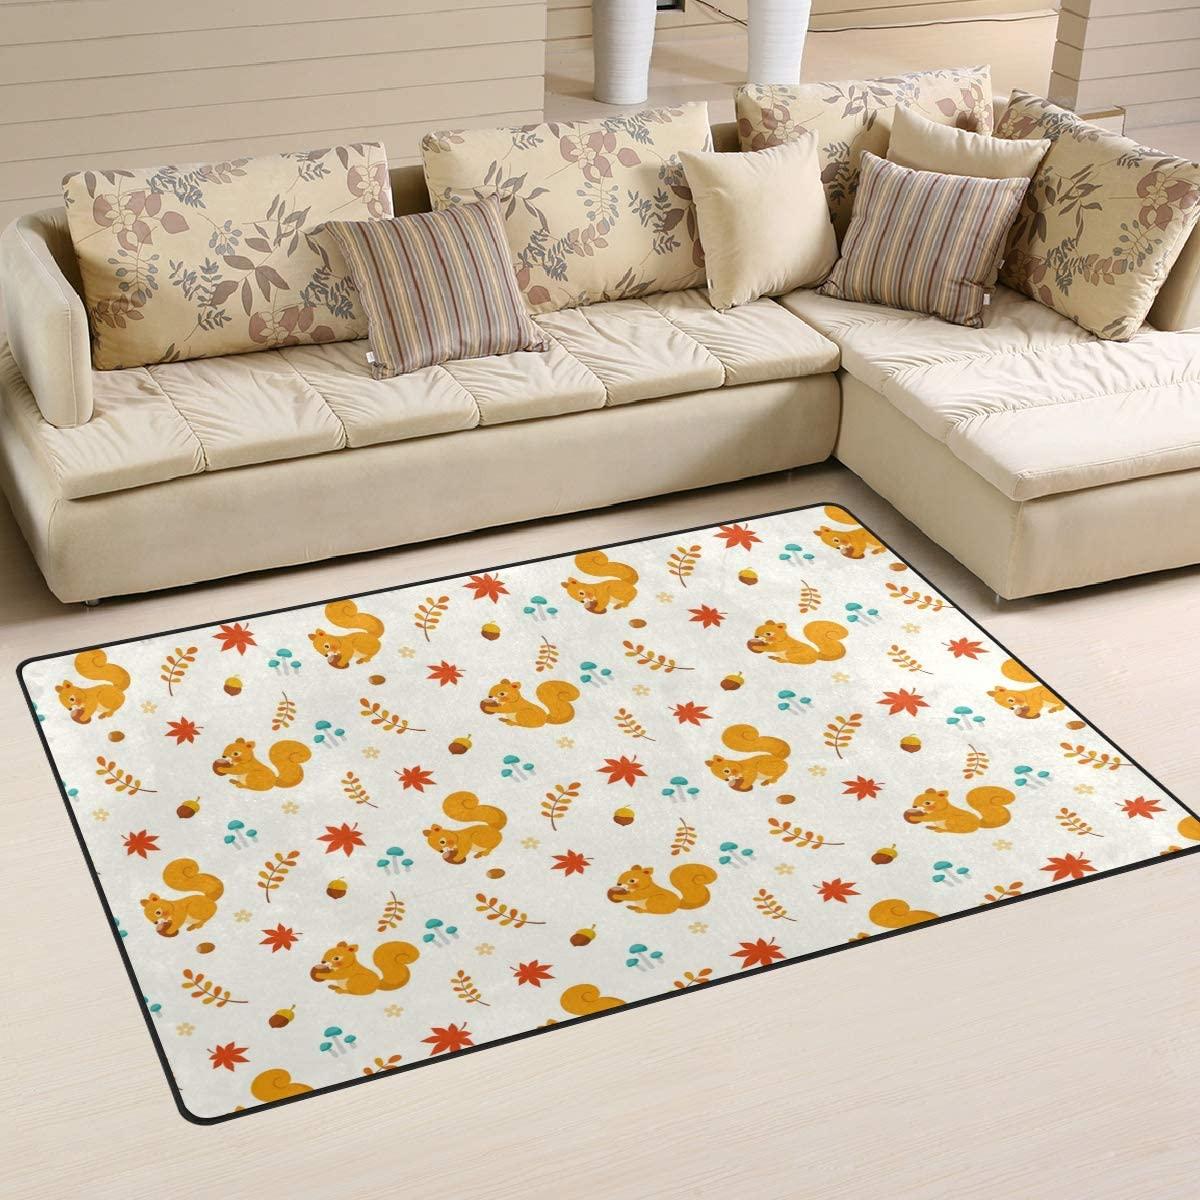 ALAZA Autumn Area Rug,Cute Squirrel Floor Rug Non-Slip Doormat for Living Dining Dorm Room Bedroom Decor 31x20 Inch